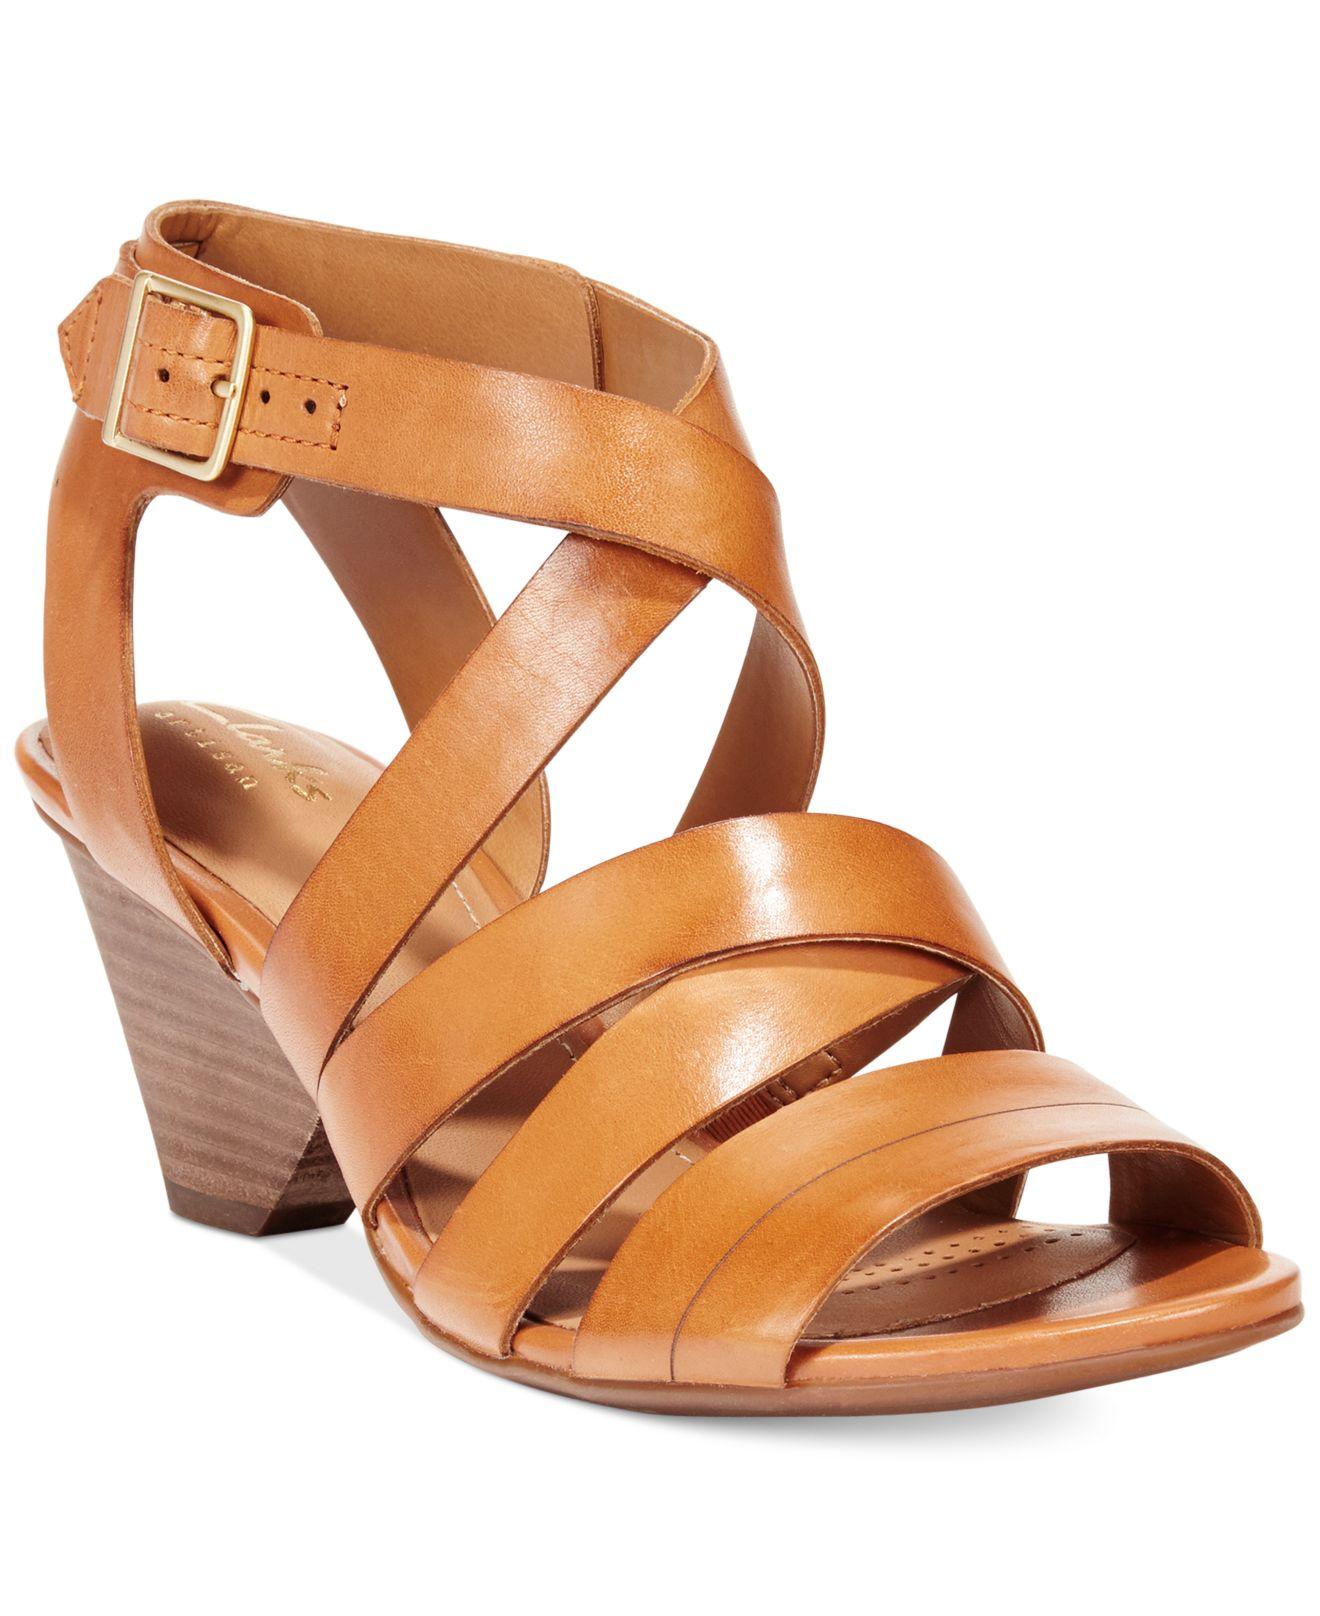 8783dfb3c9d7 Lyst Clarks Women S Ranae Estelle Dress Sandals In Brown